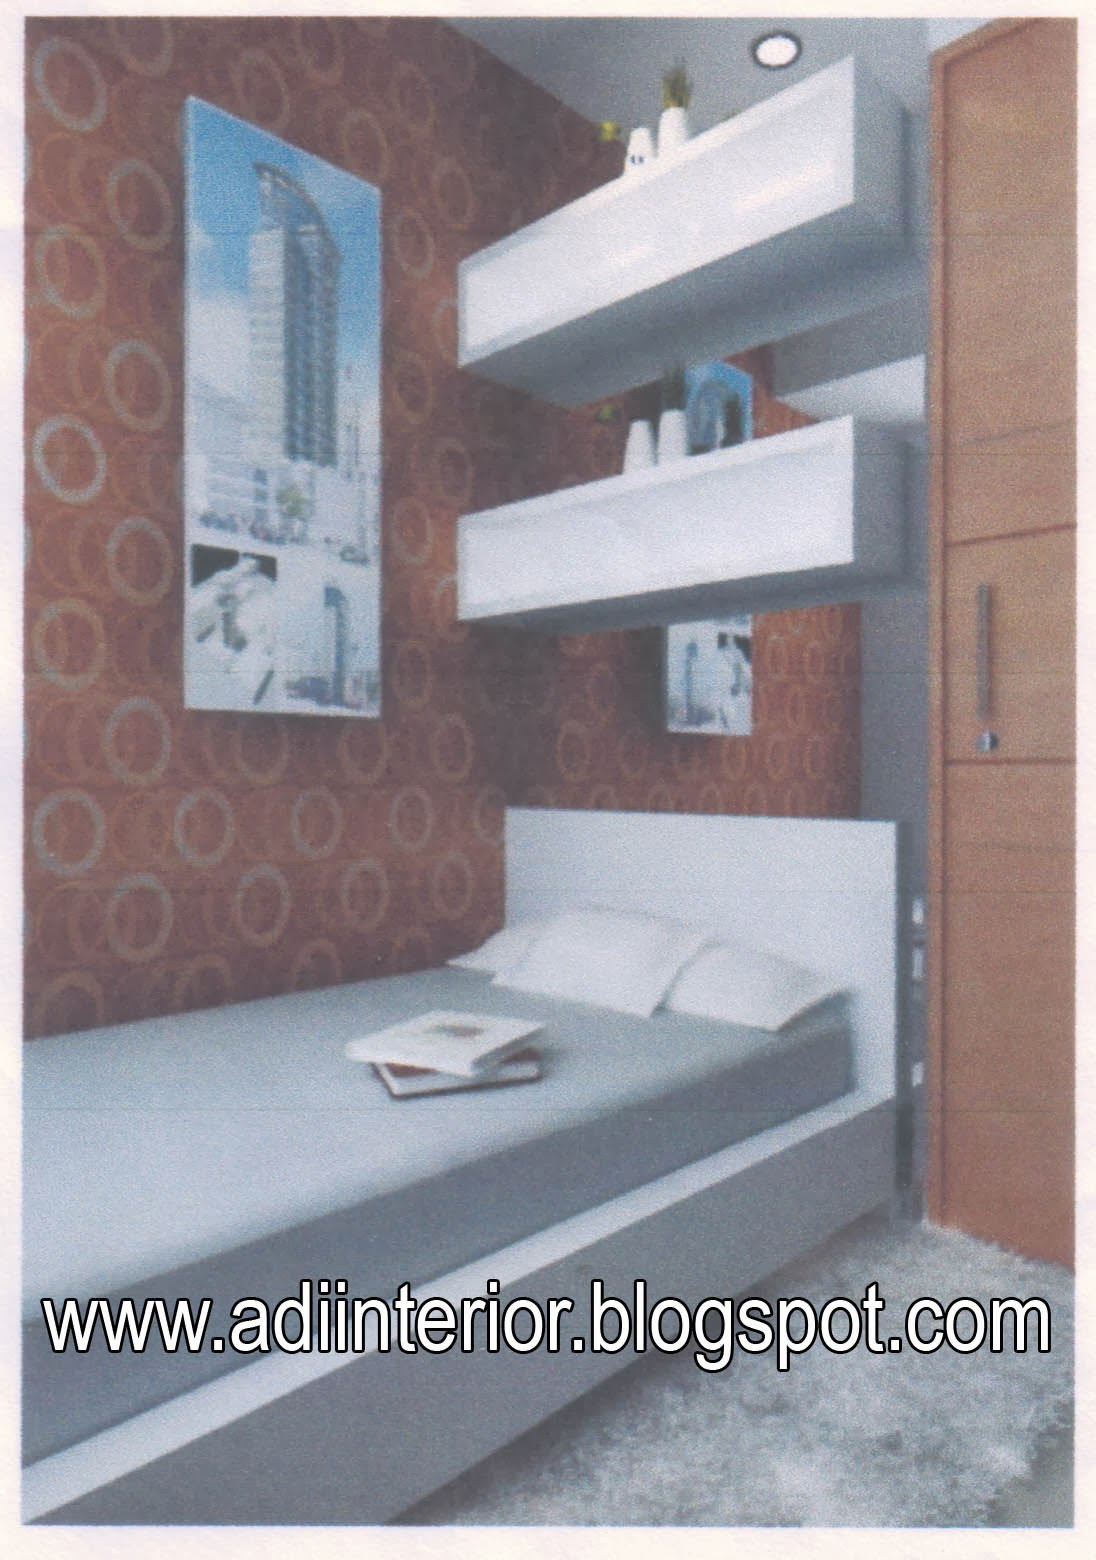 Interior Surabaya Desain Interior Furniture Adi Arsitek